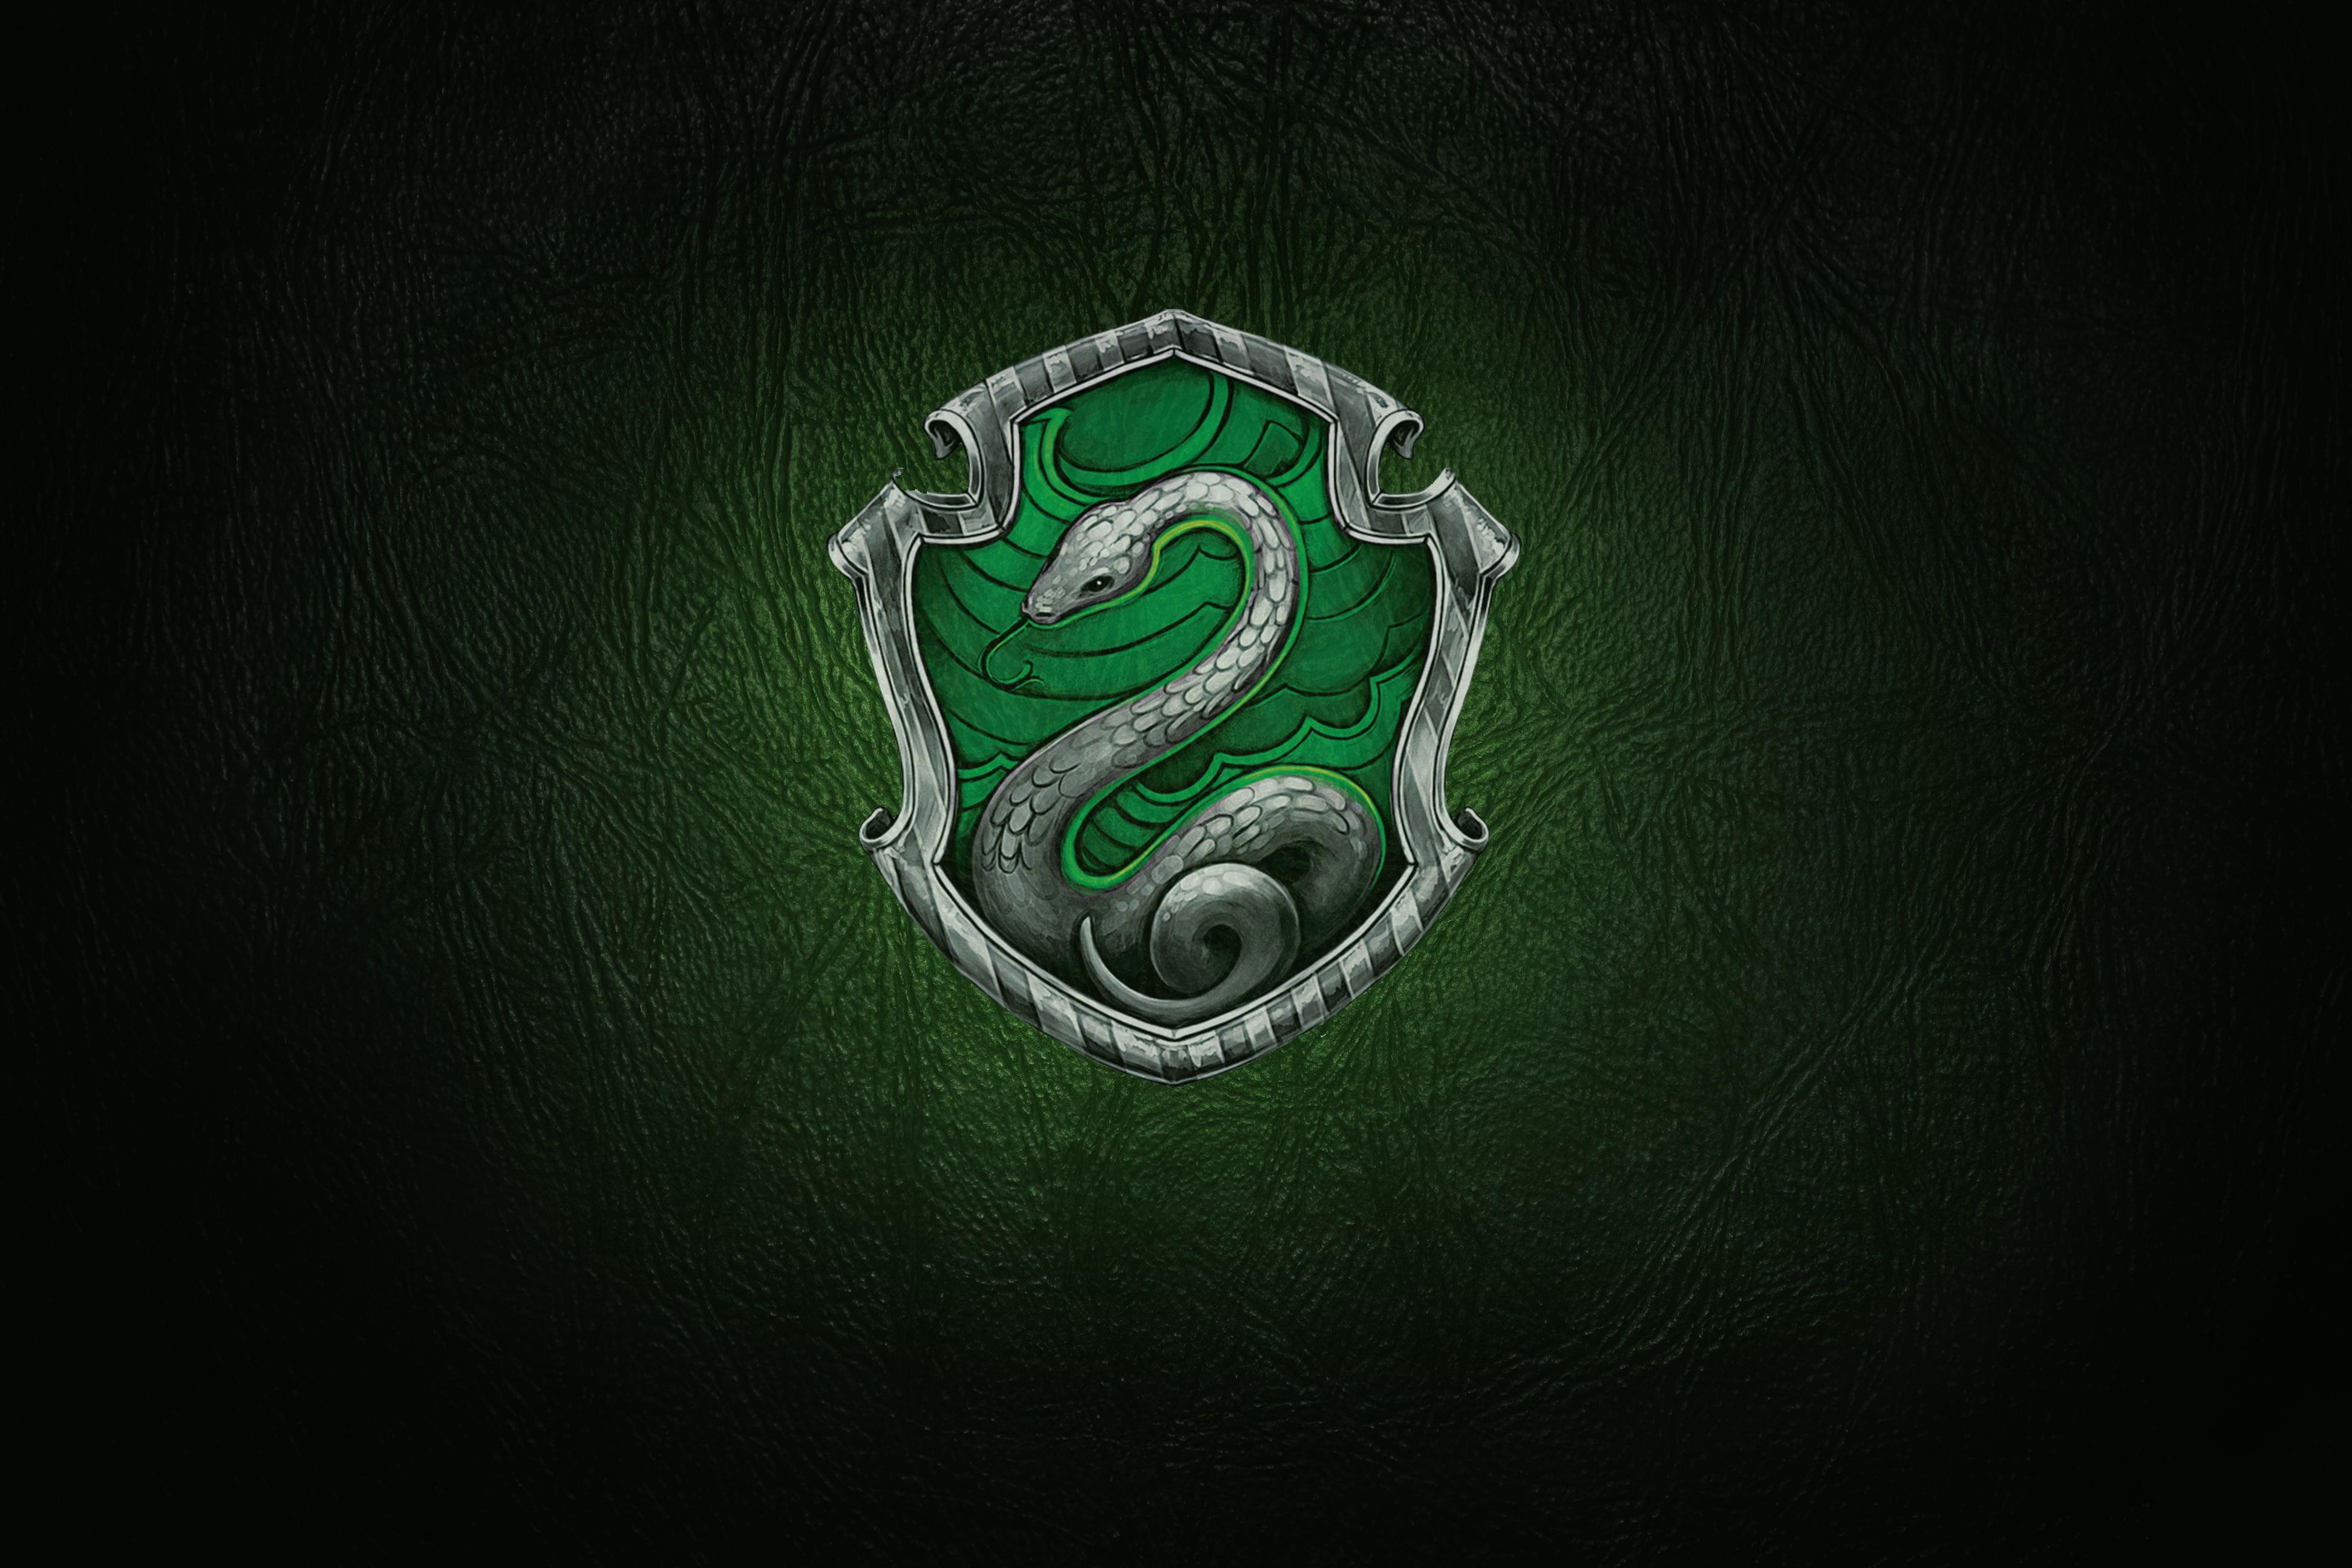 Slytherin Harry Potter Desktop Wallpapers Top Free Slytherin Harry Potter Desktop Backgrounds Wallpaperaccess